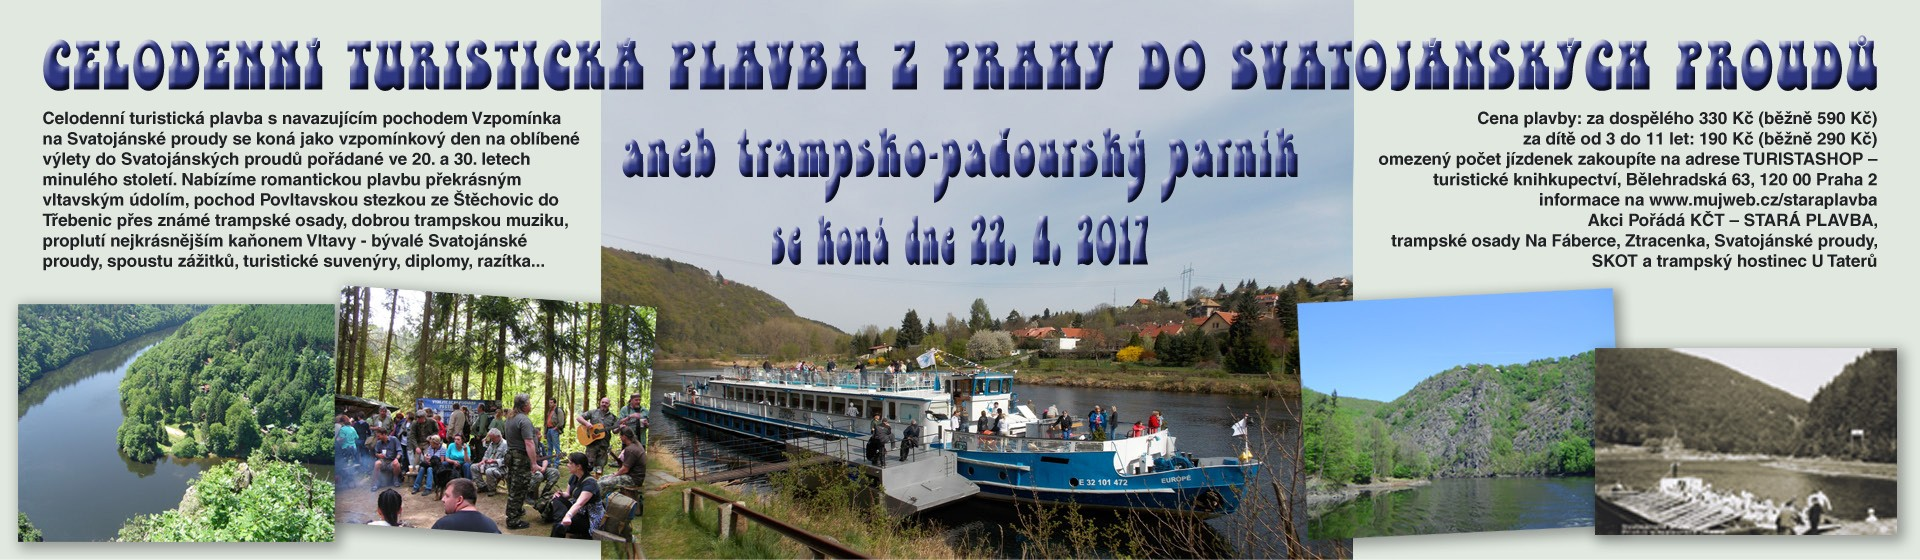 Turistická plavba Z Prahy do Svatojánských proudů aneb trampsko-paďourský parník 22. 4. 2017 -12. ročník